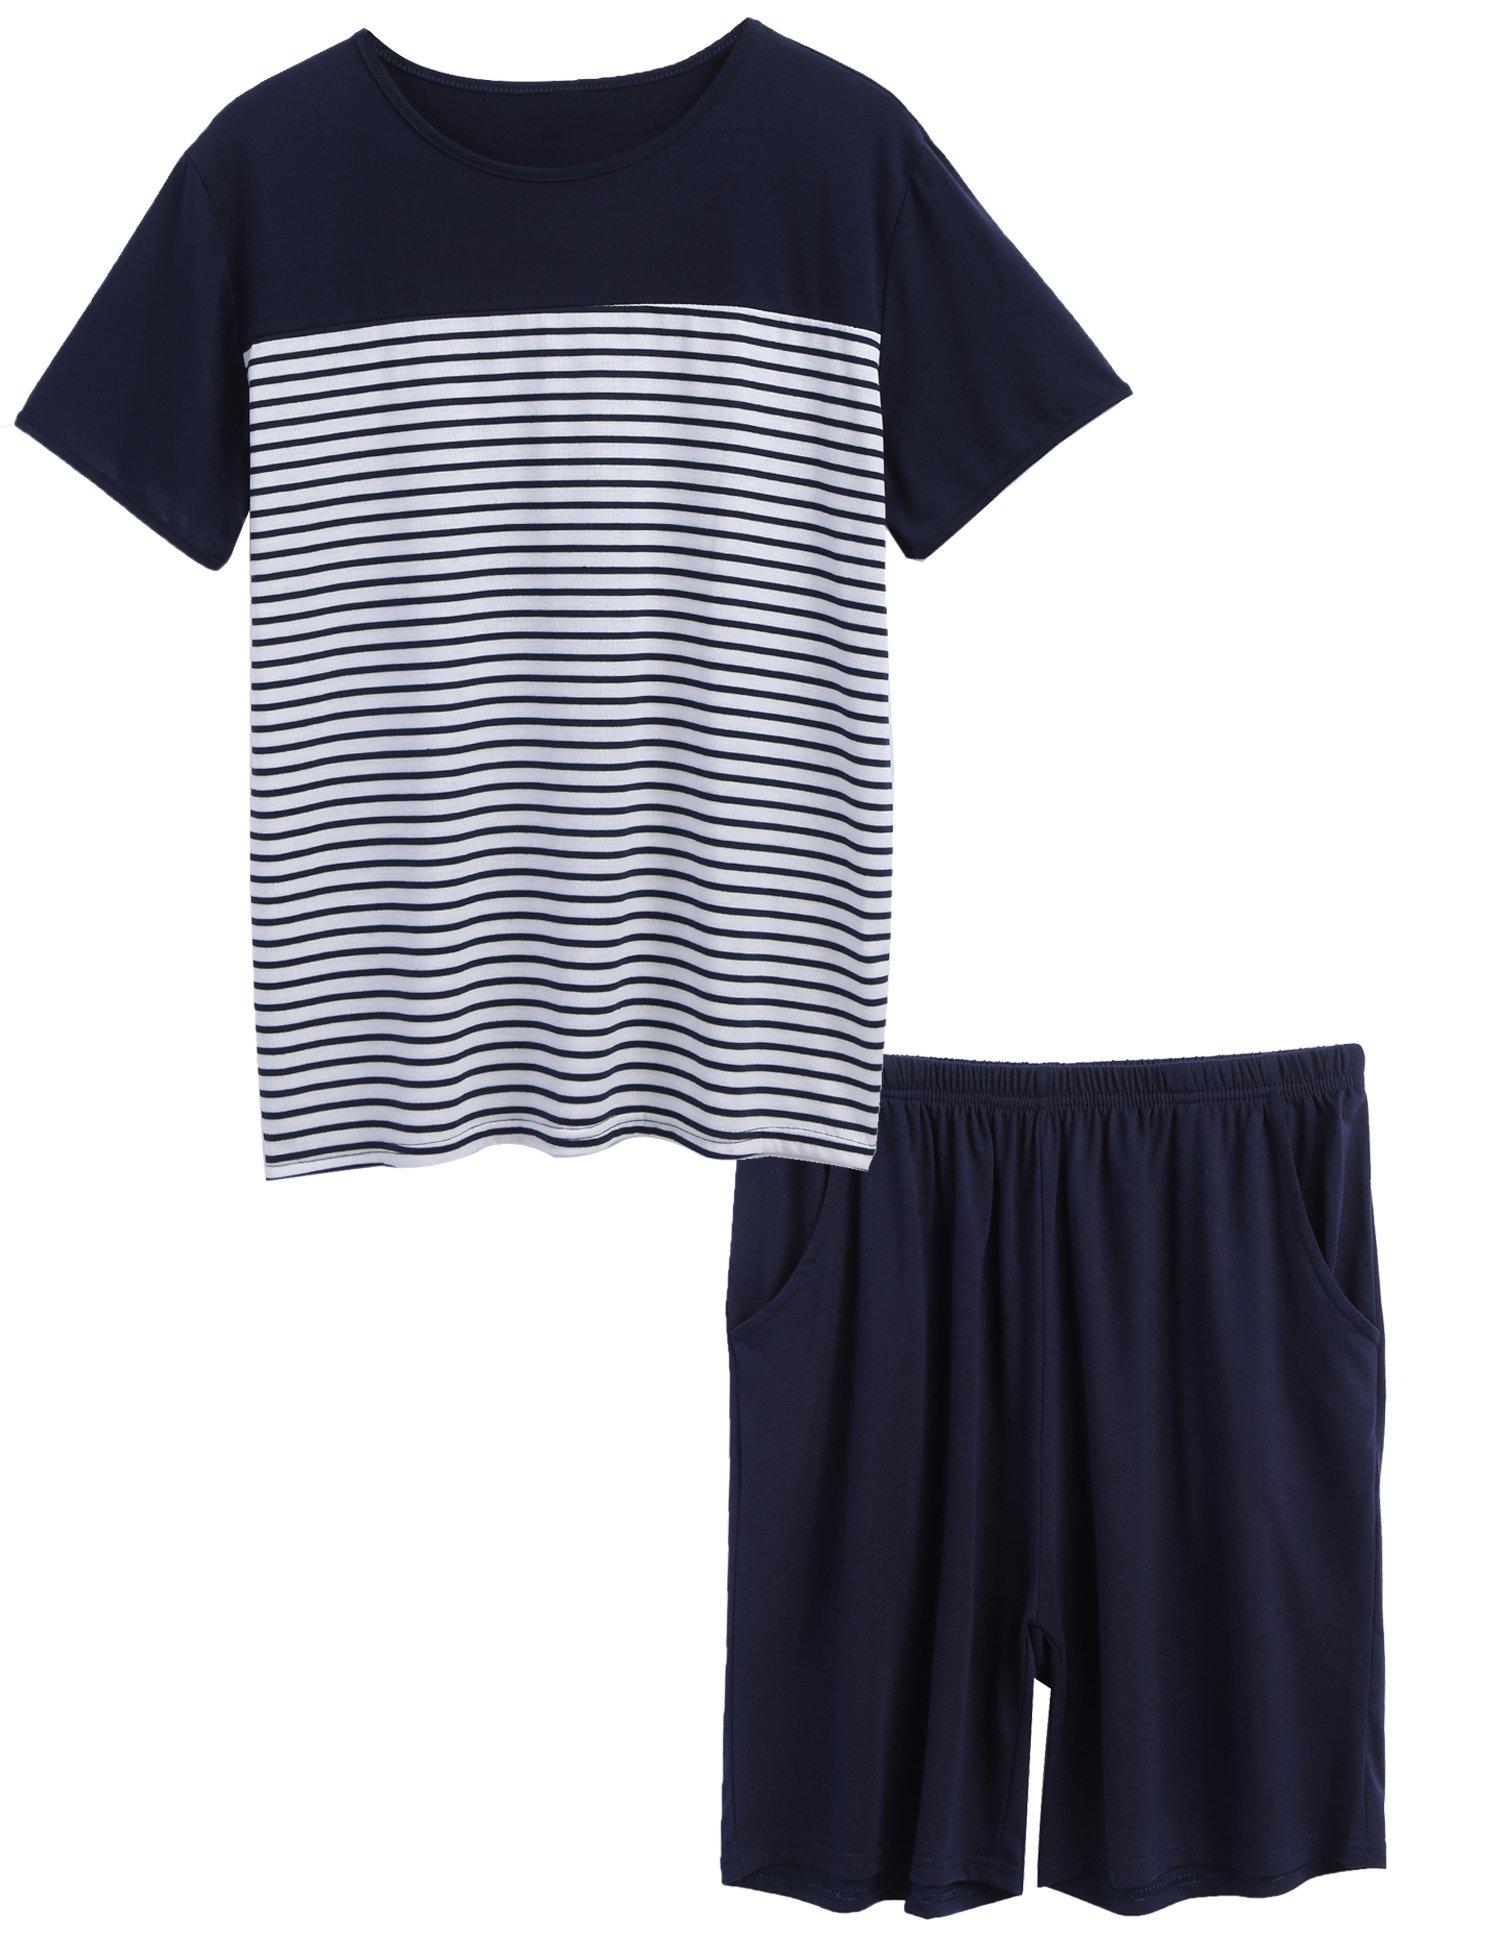 luxilooks Plus Size Lounge Set Men's 2-Piece Sleepwear Set Classic Summer Pajama Set (Navy,XXL)